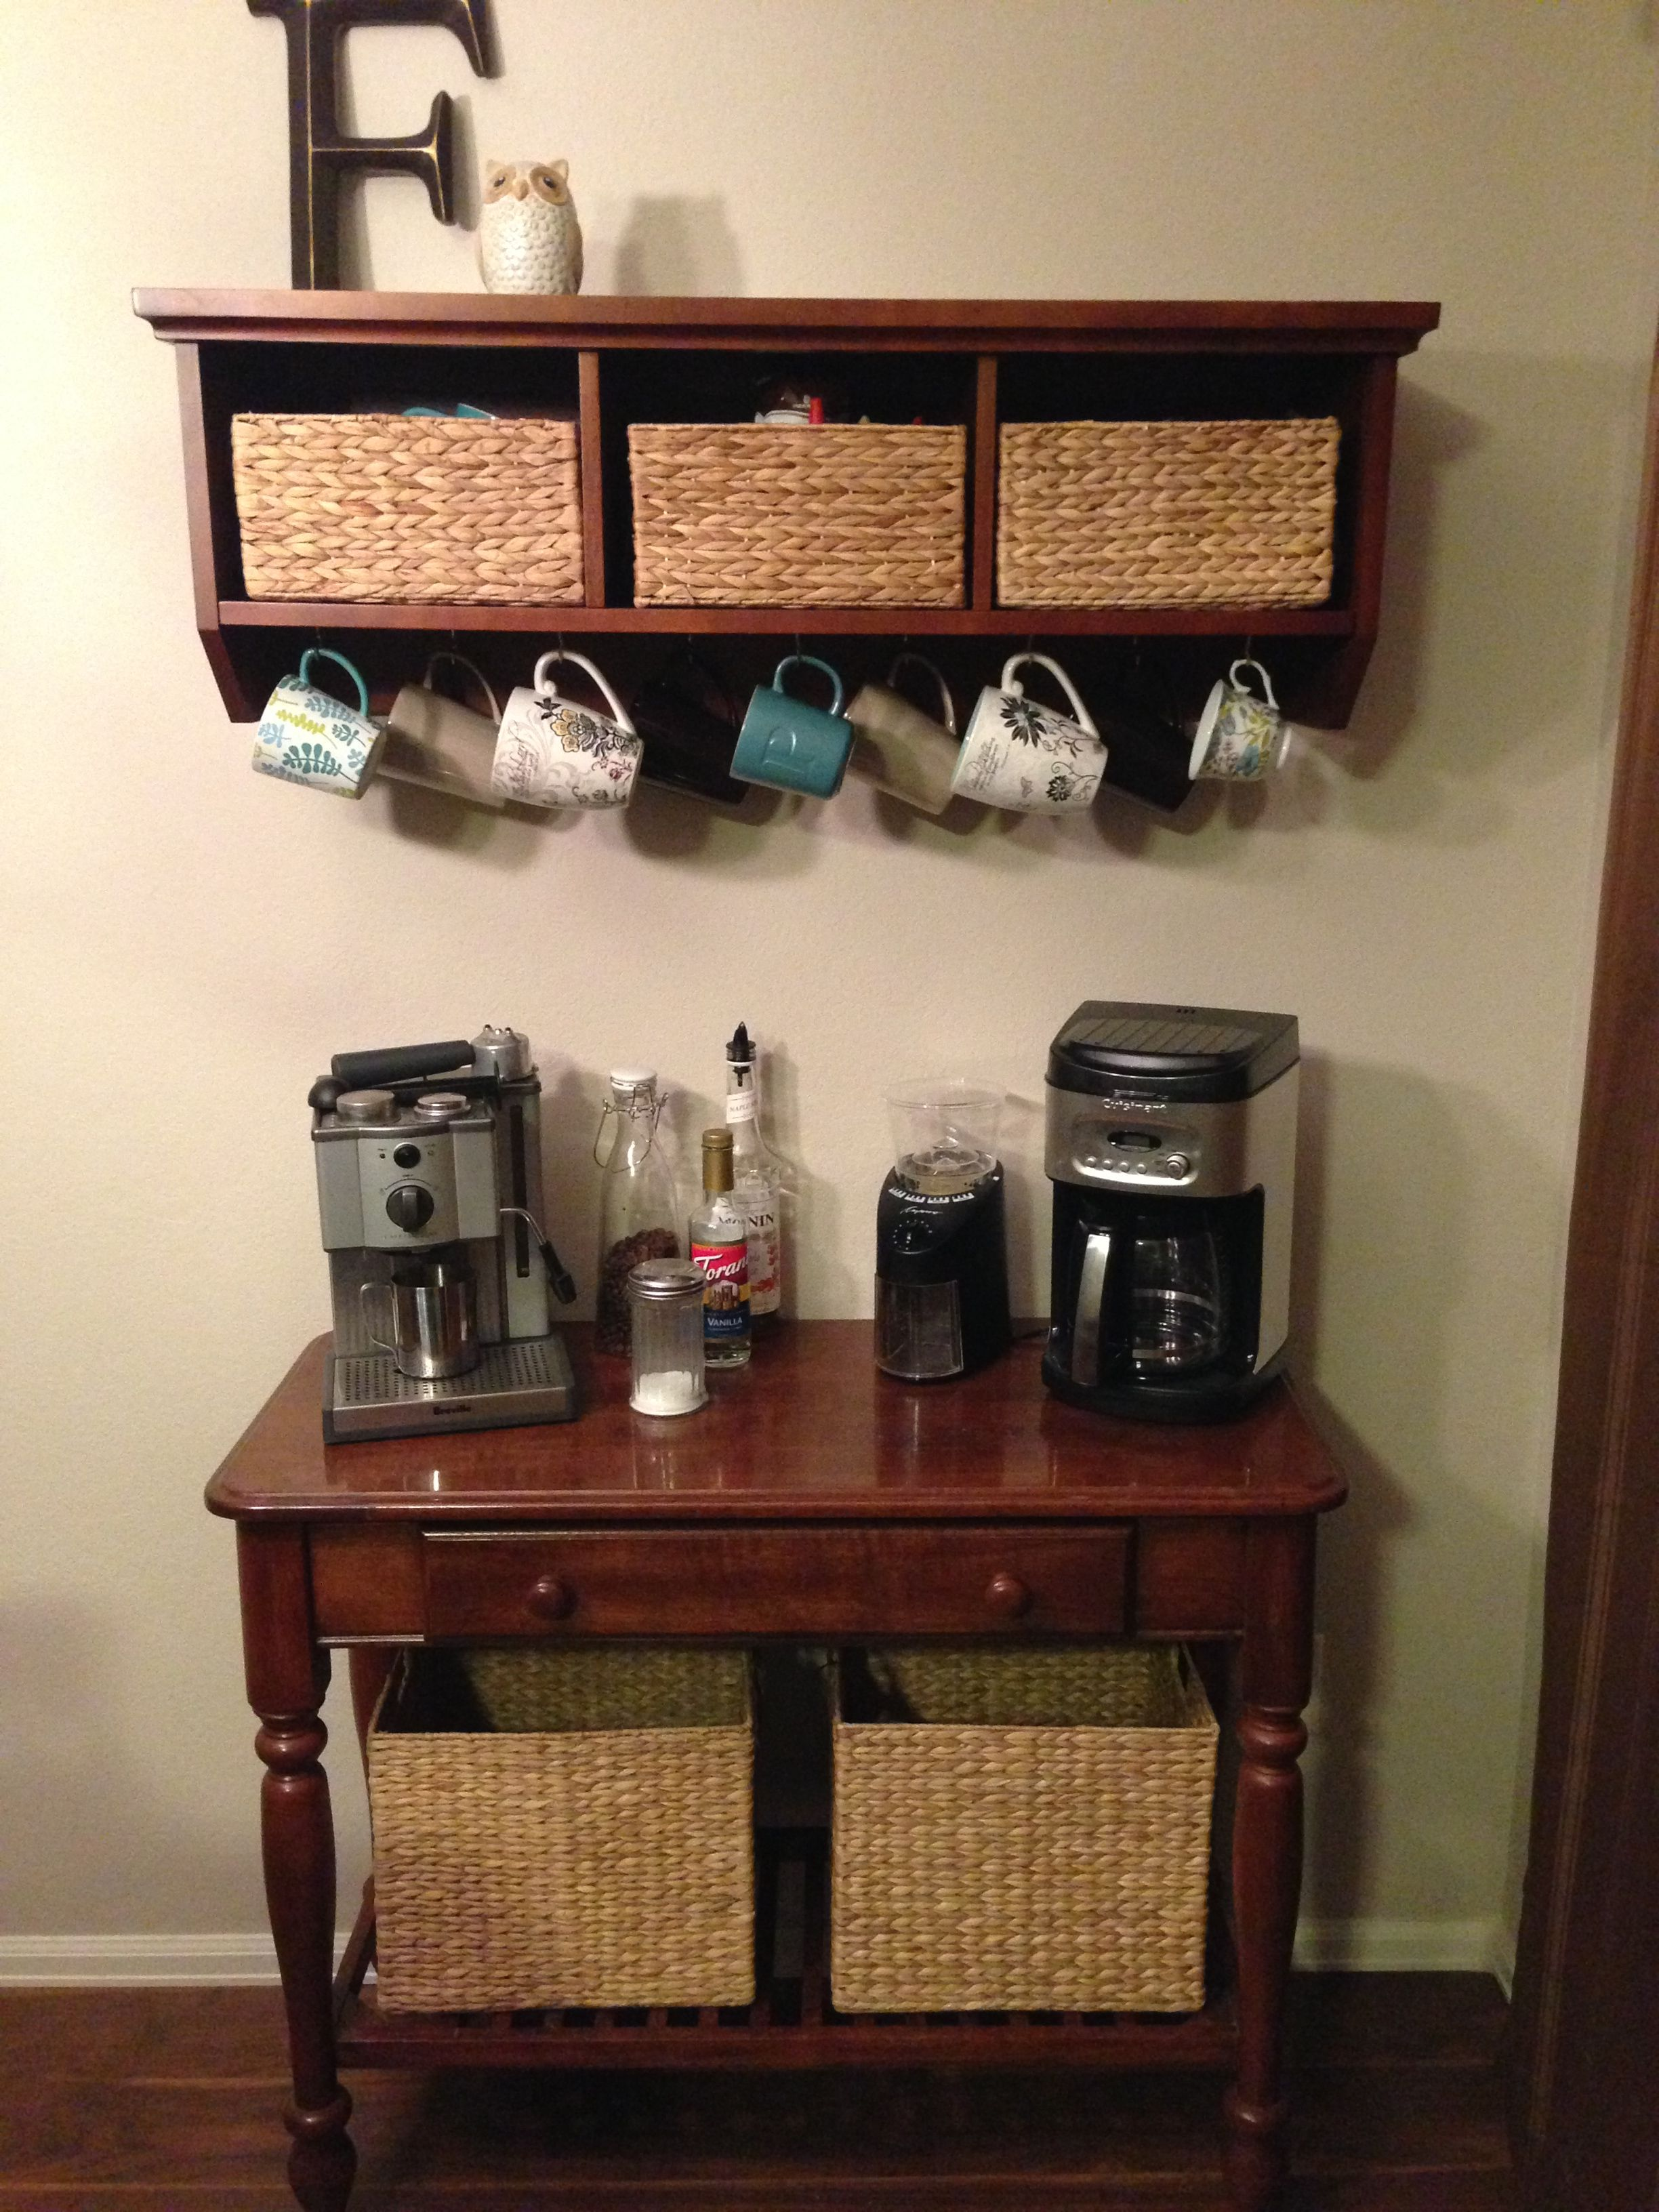 Hang Mugs Under Cabinet In Coffee Nook Area